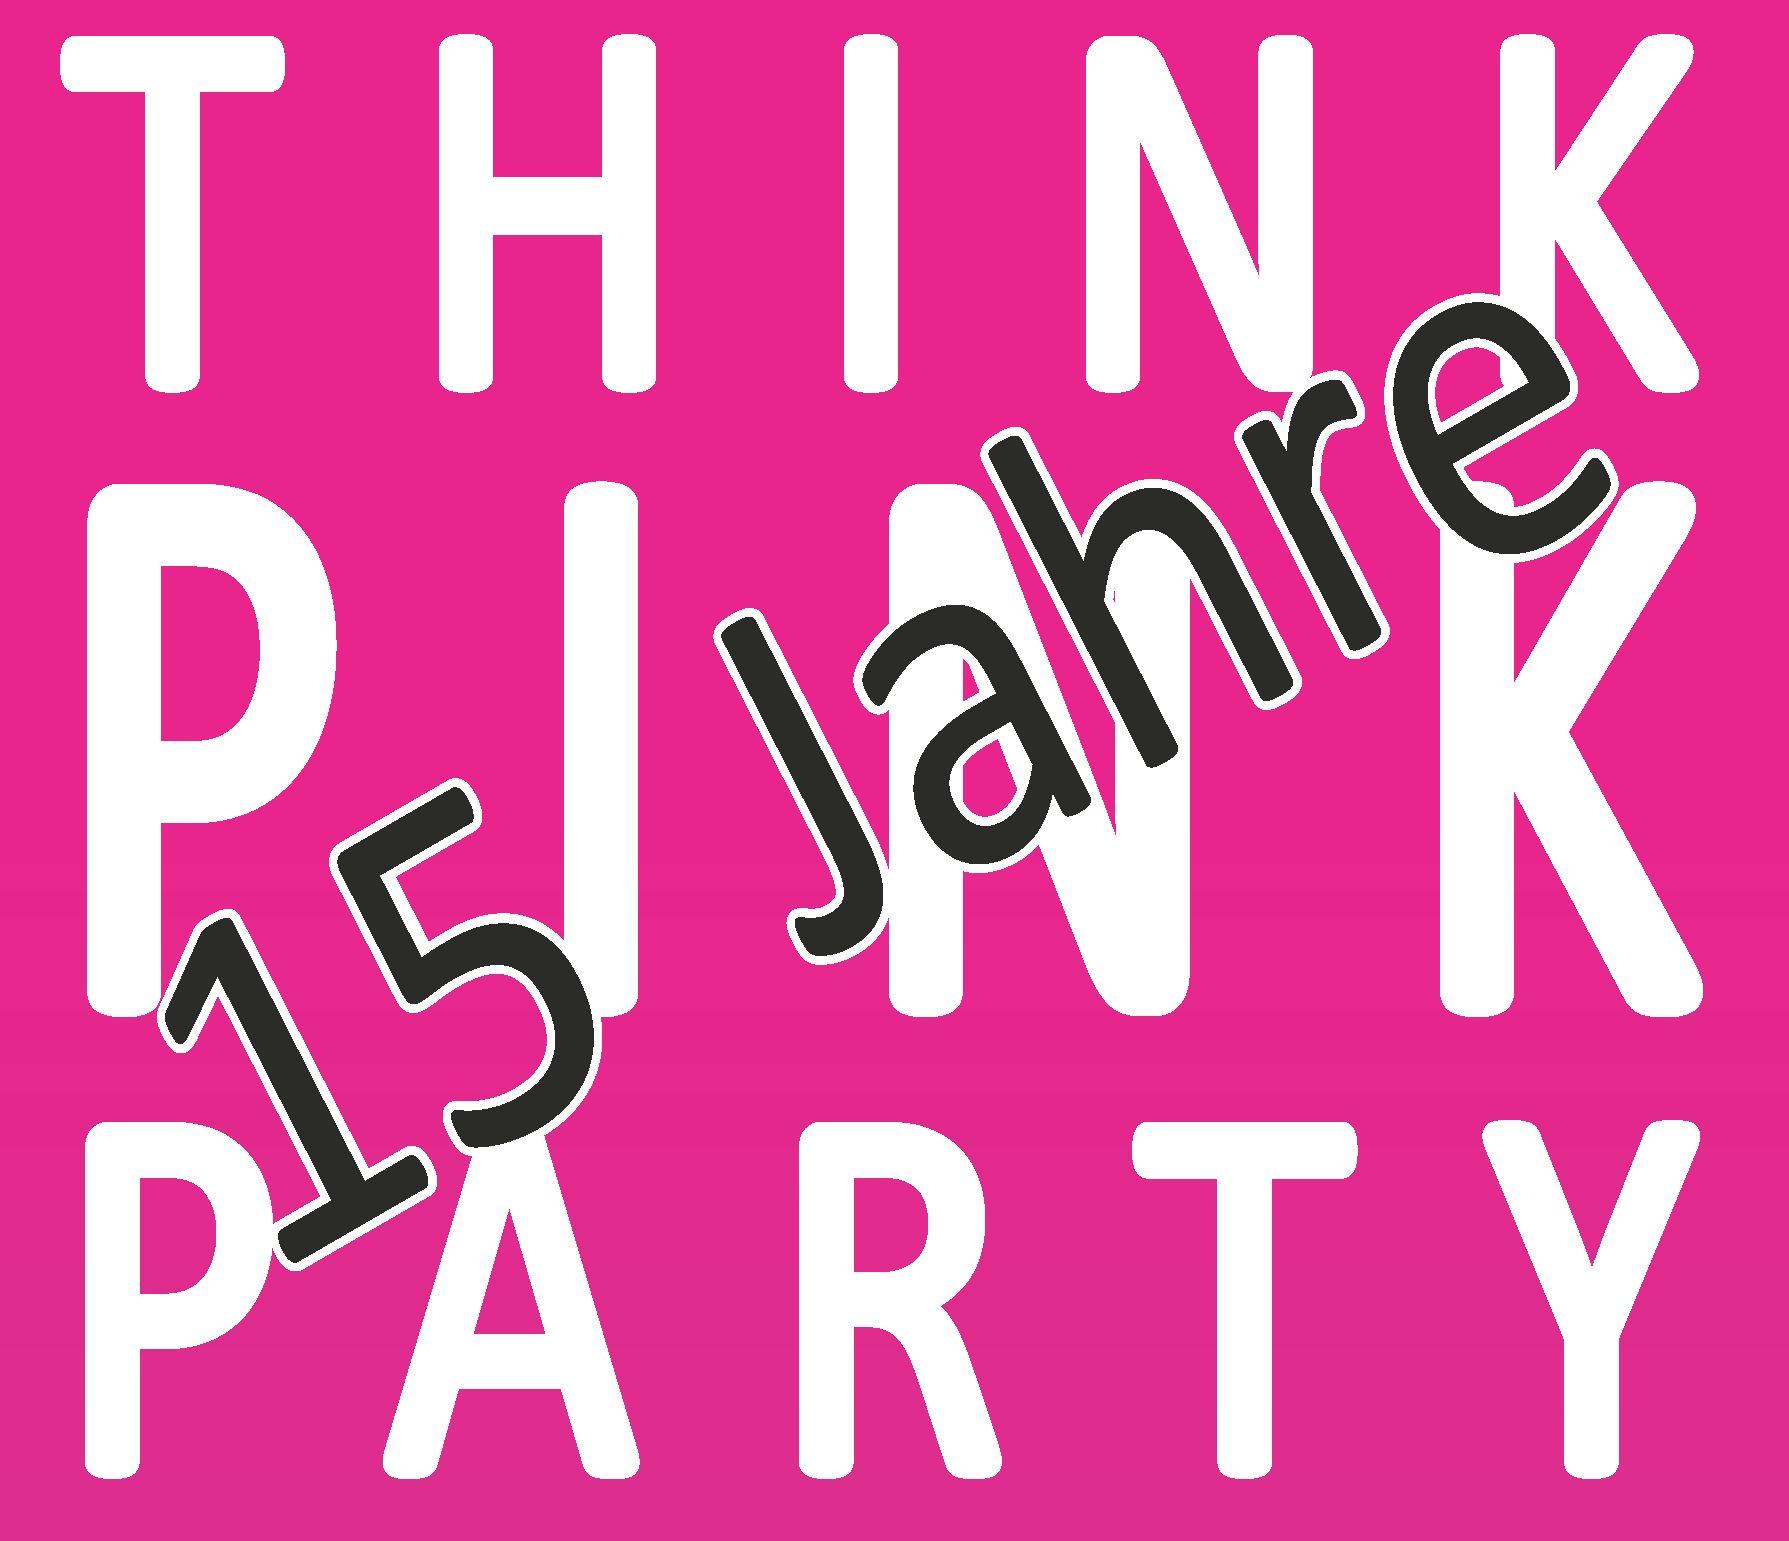 Pink Party am Sa. 20.07.2019 / Feedback zu unserer CuteCactus Party